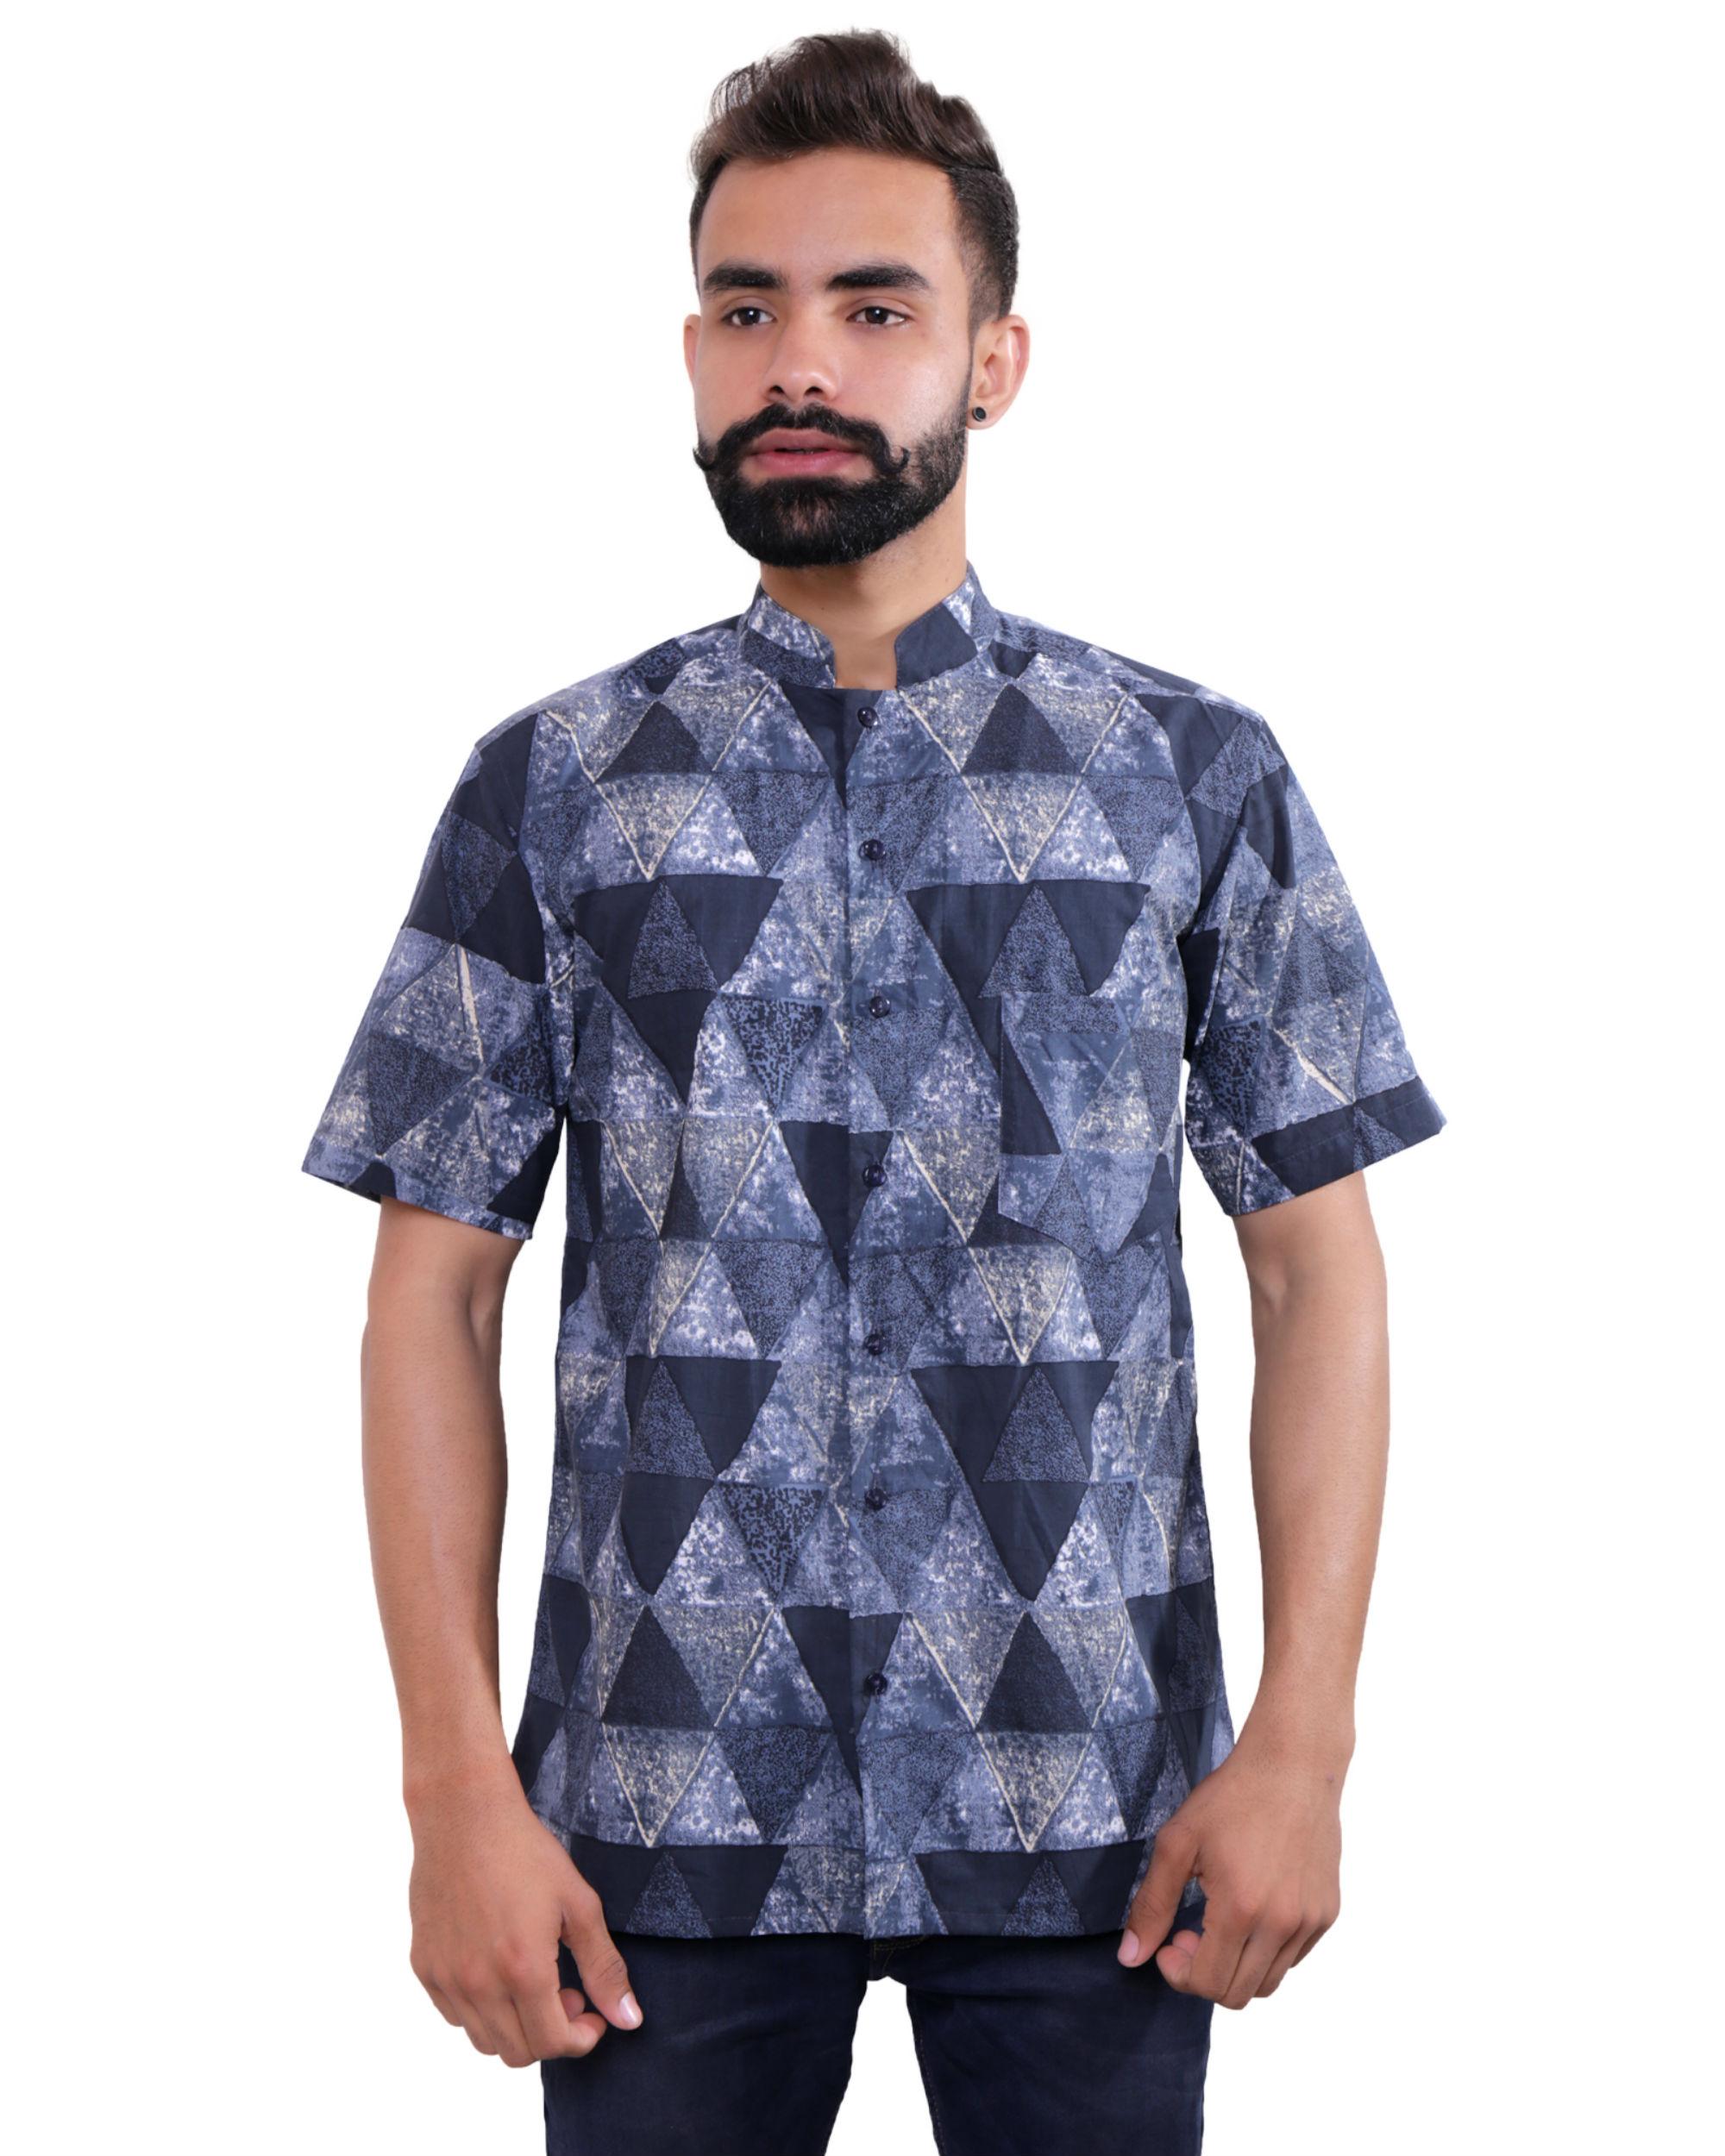 Blue grey triangle shirt